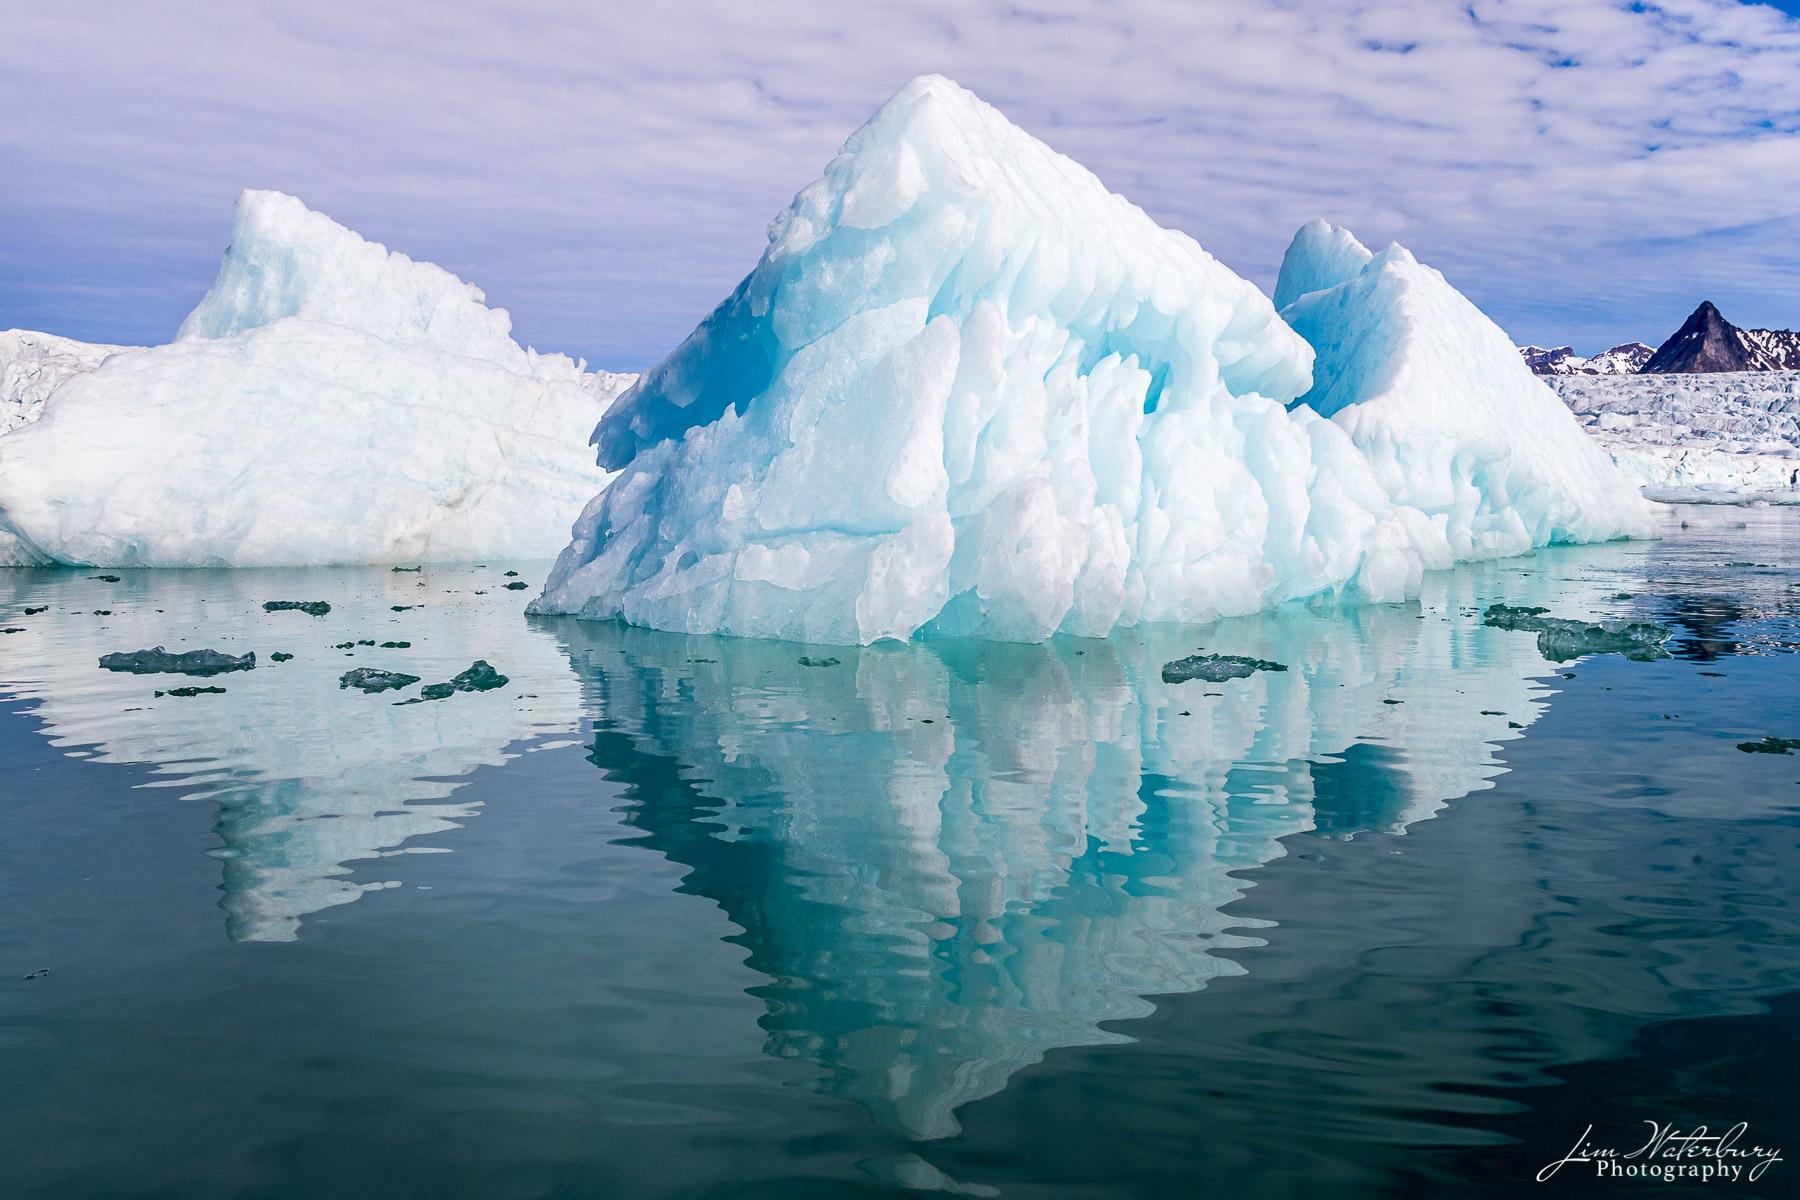 ice, iceberg, glacier, Spitsbergen, Svalbard, fjord, photo